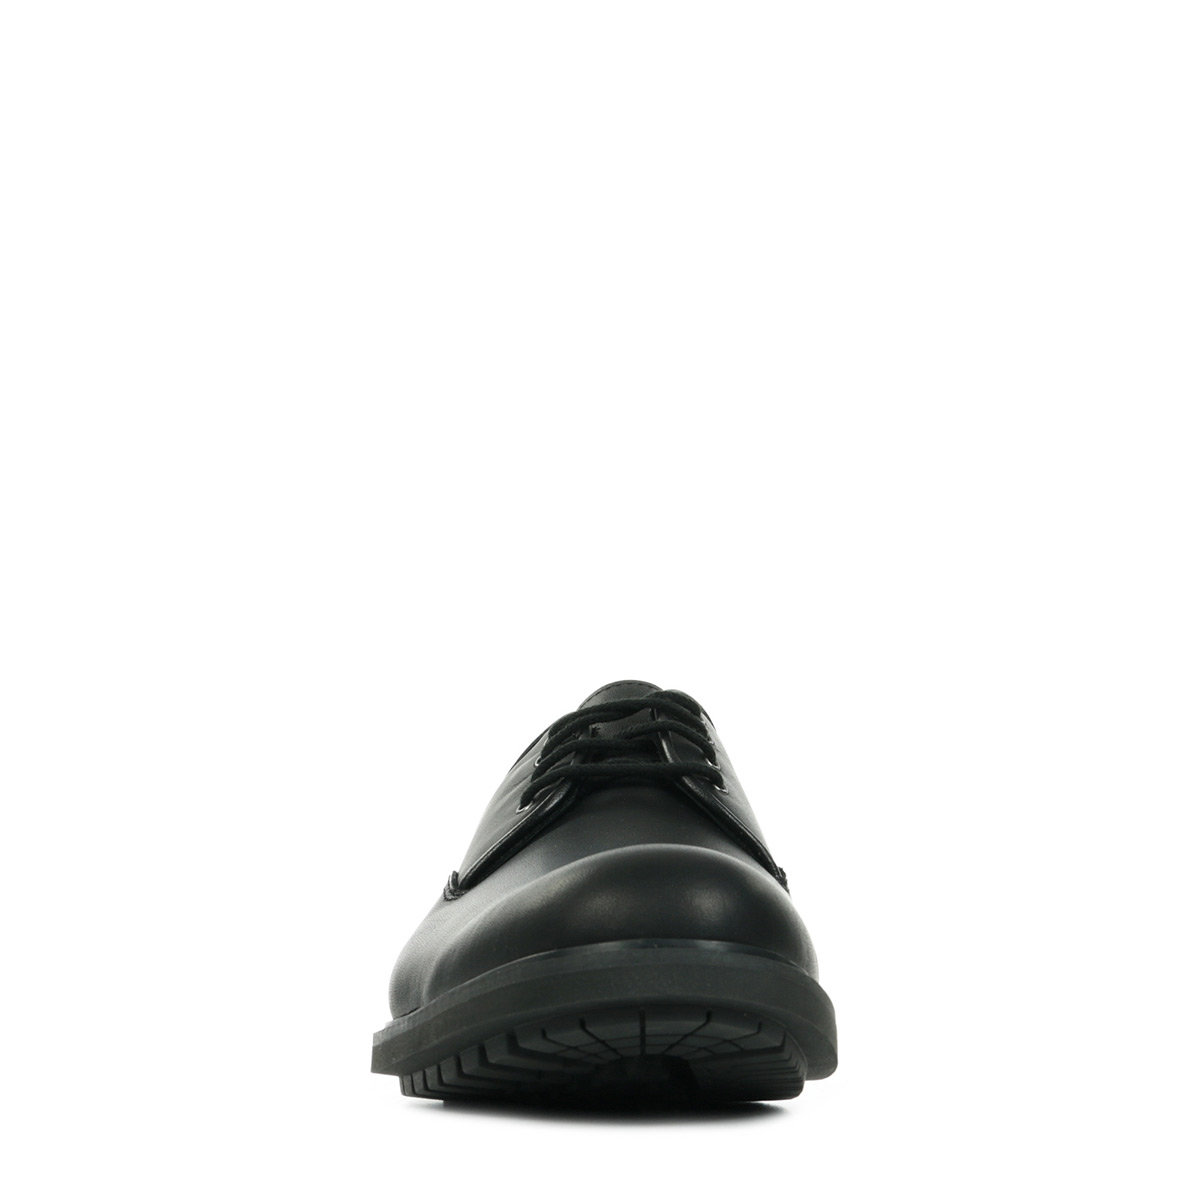 Stormbuck Full Homme Waterproof Oxford Black Timberland grain C5549rVille 0PNOnk8wXZ